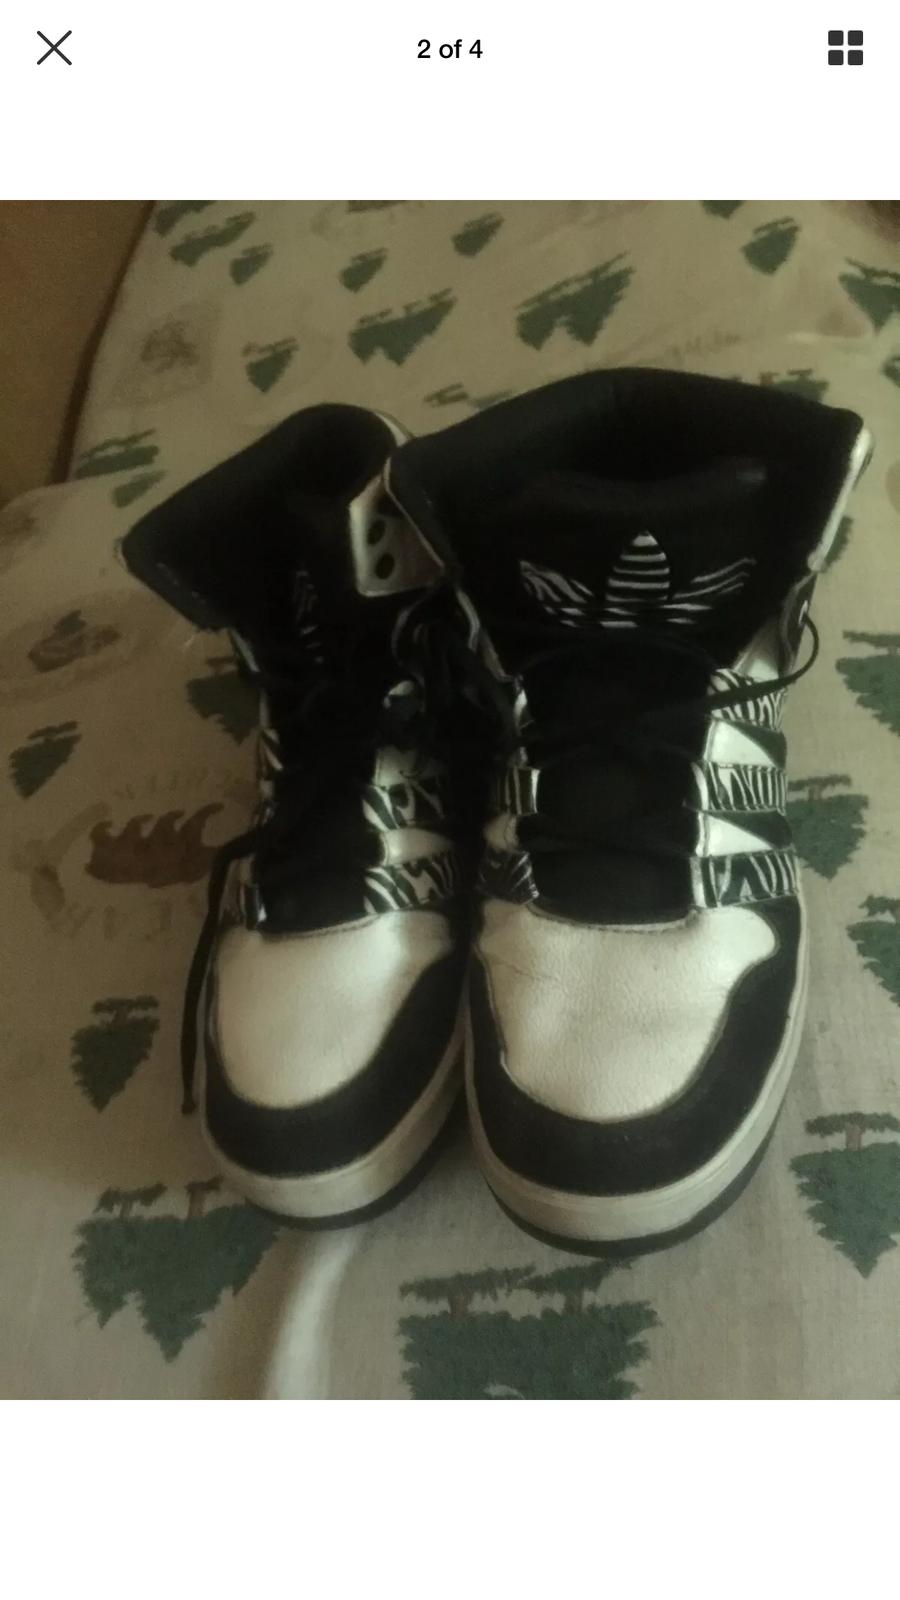 black and white zebra print pattern sneakers adidas 7.5 hightops high tops